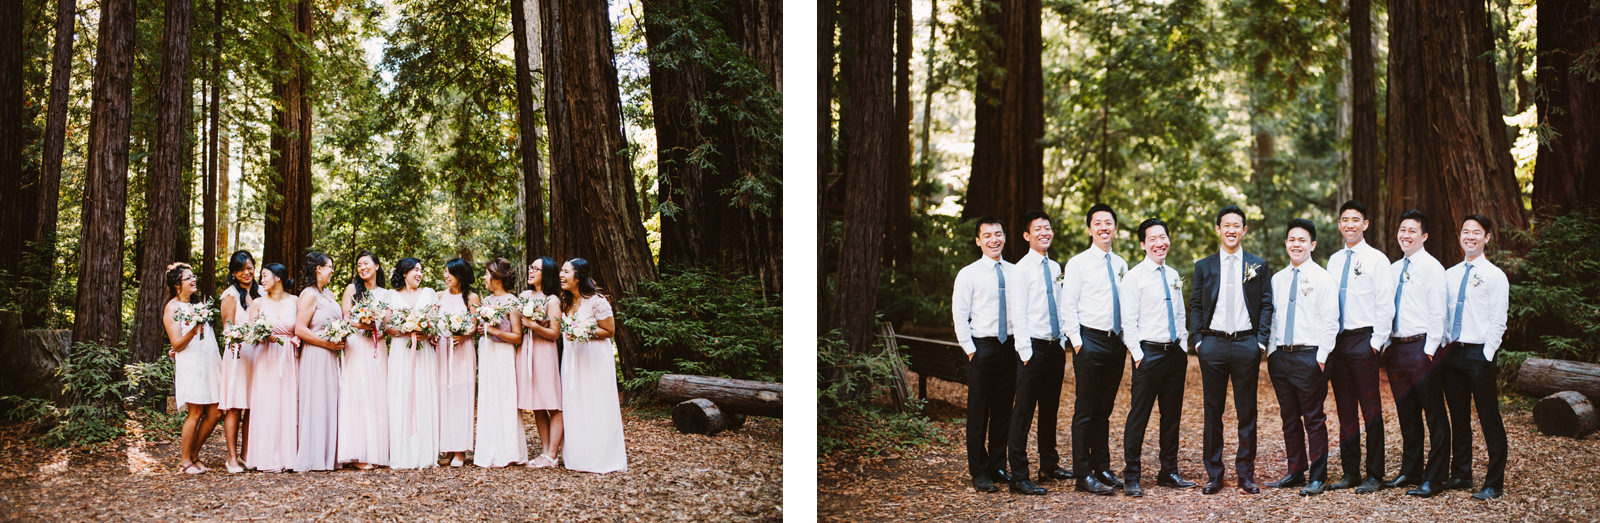 kimclay-blog-010 REDWOOD FOREST WEDDING